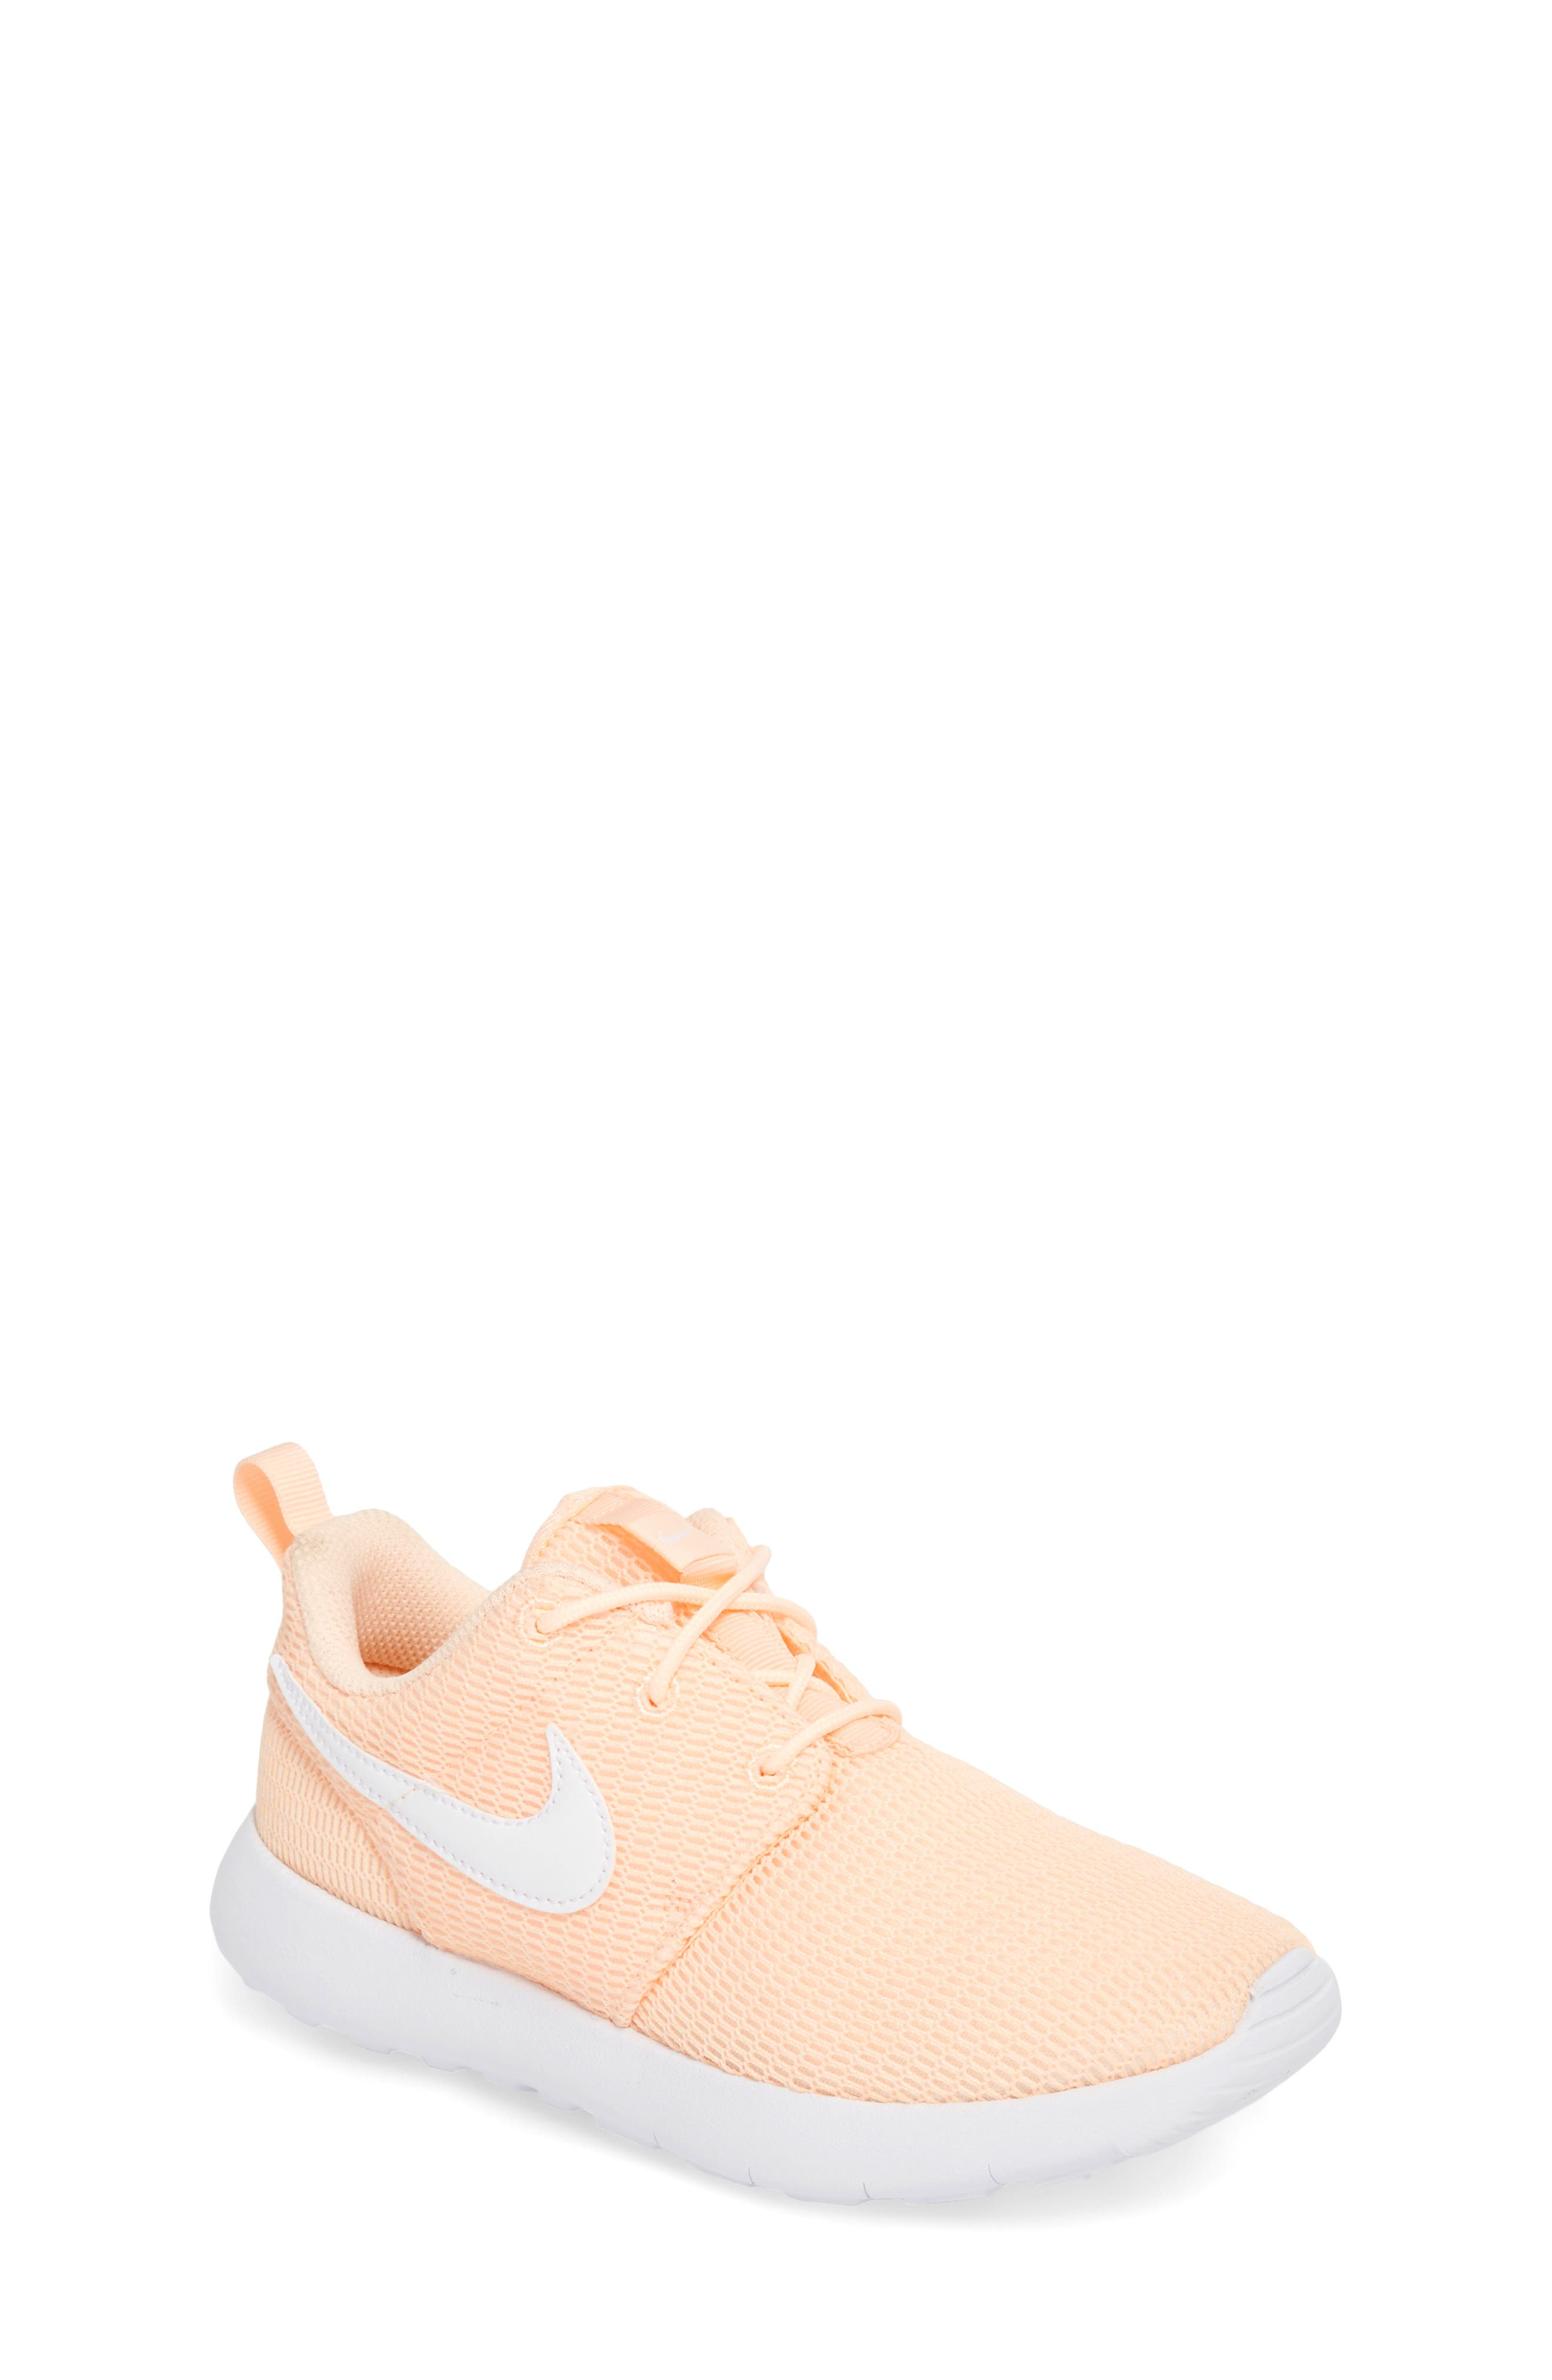 'Roshe Run' Athletic Shoe,                         Main,                         color, Crimson Tint/ White